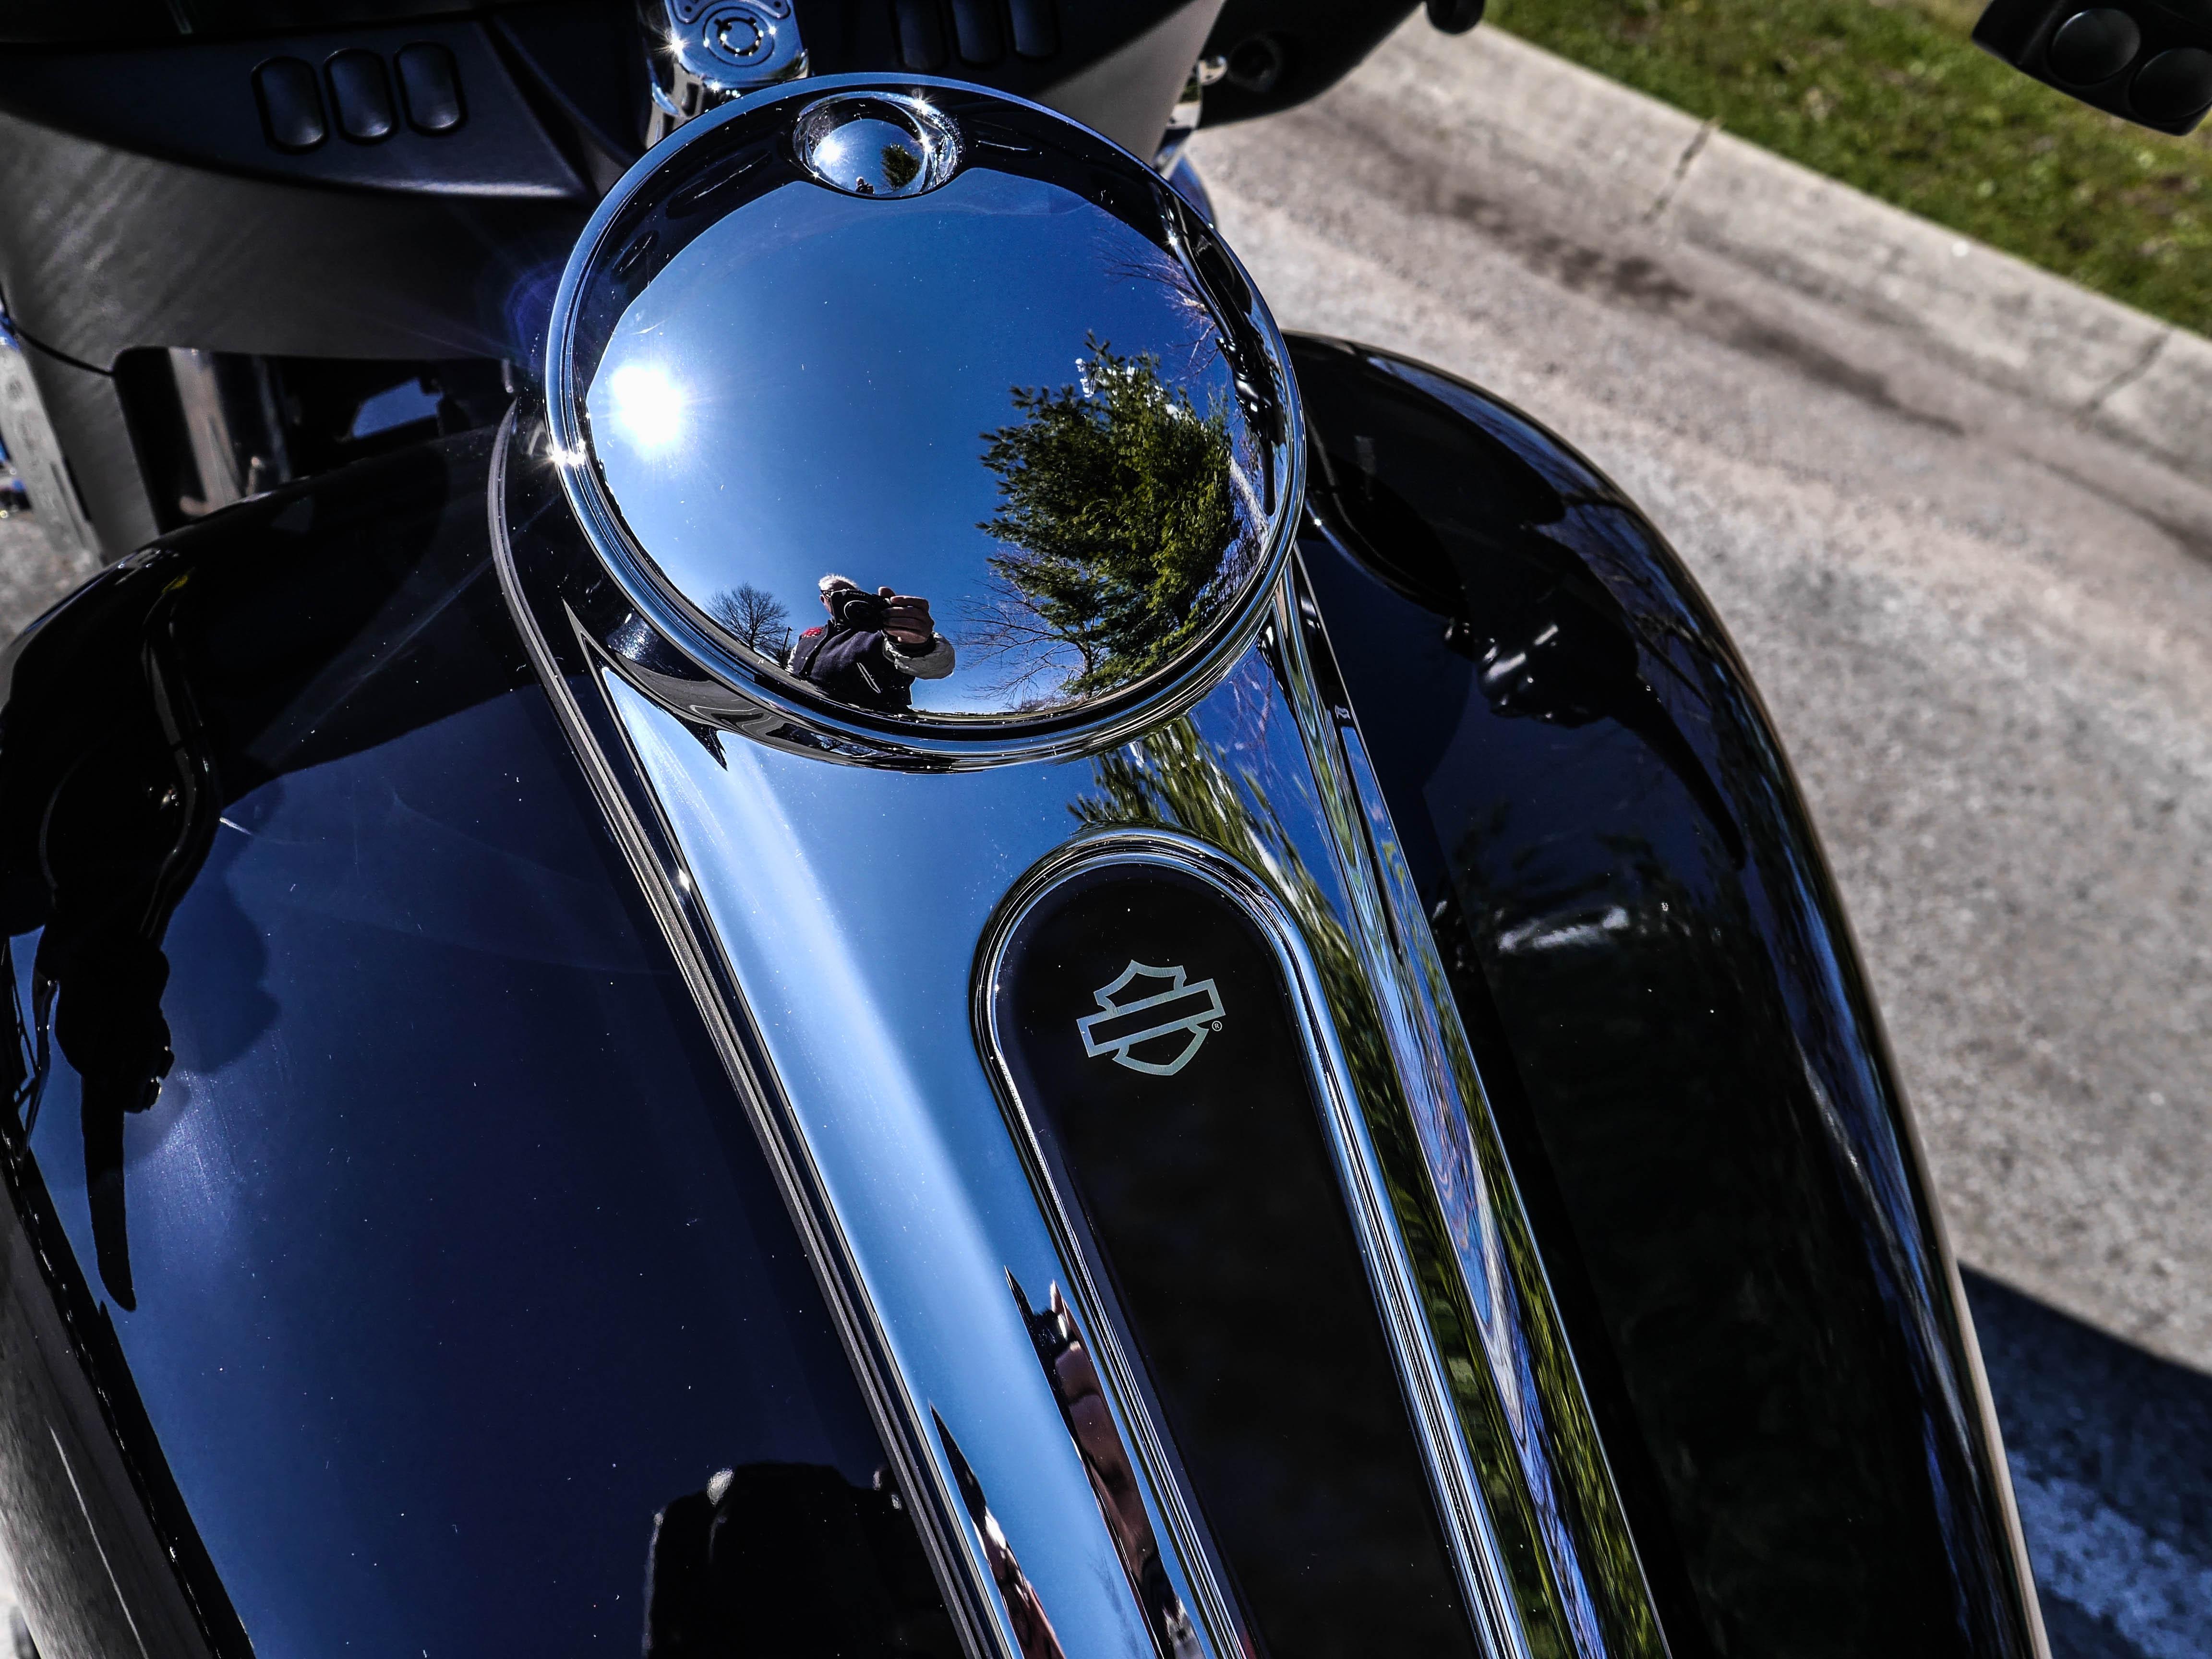 New 2019 Harley-Davidson Touring Electra Glide Standard